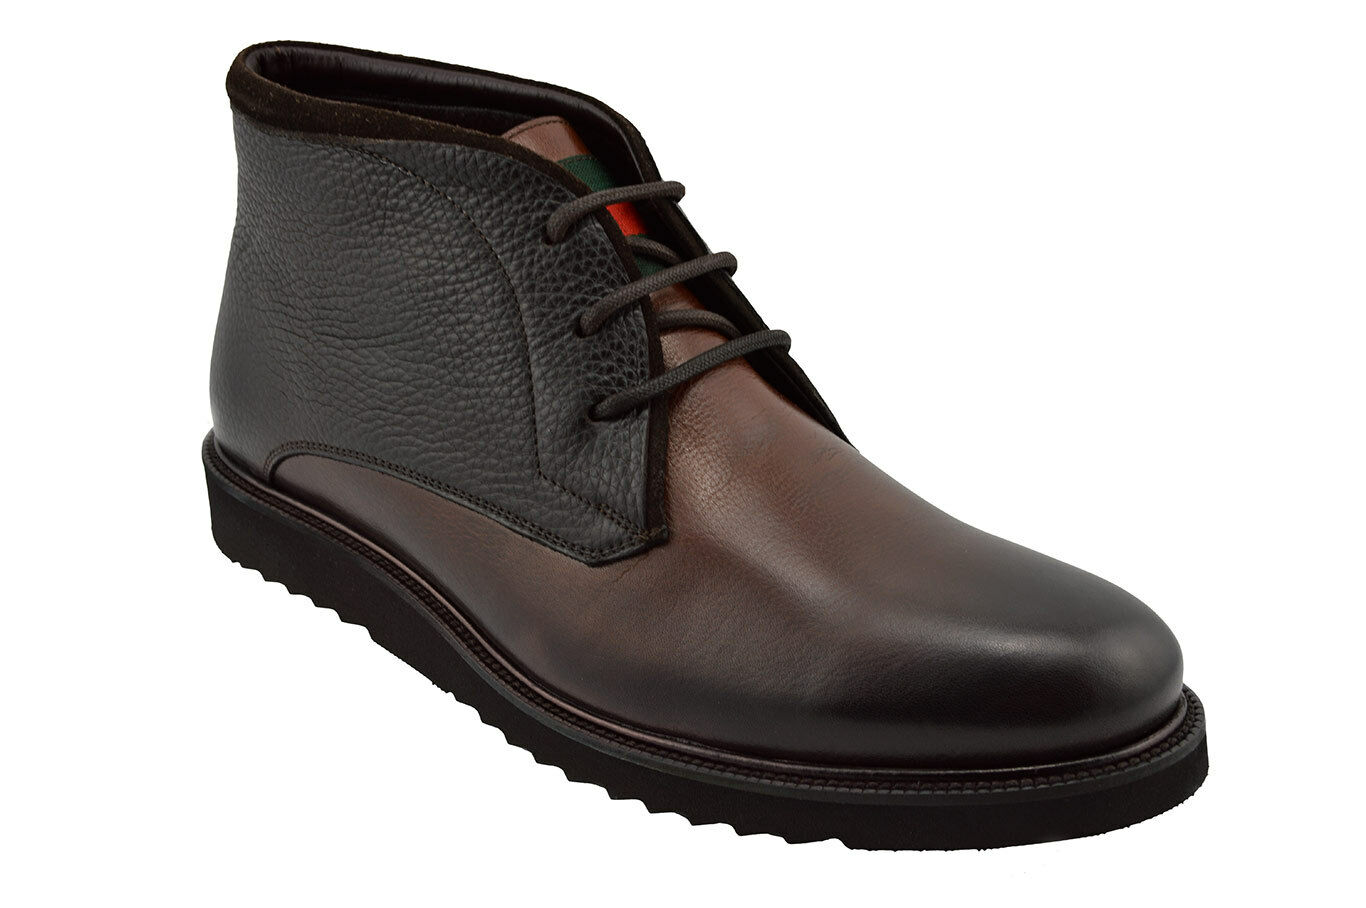 230 MASQLEN braun 2 Tone Leather CHUKKA CHUKKA CHUKKA Ankle Stiefel Men schuhe NEW COLLECTION 69a40f